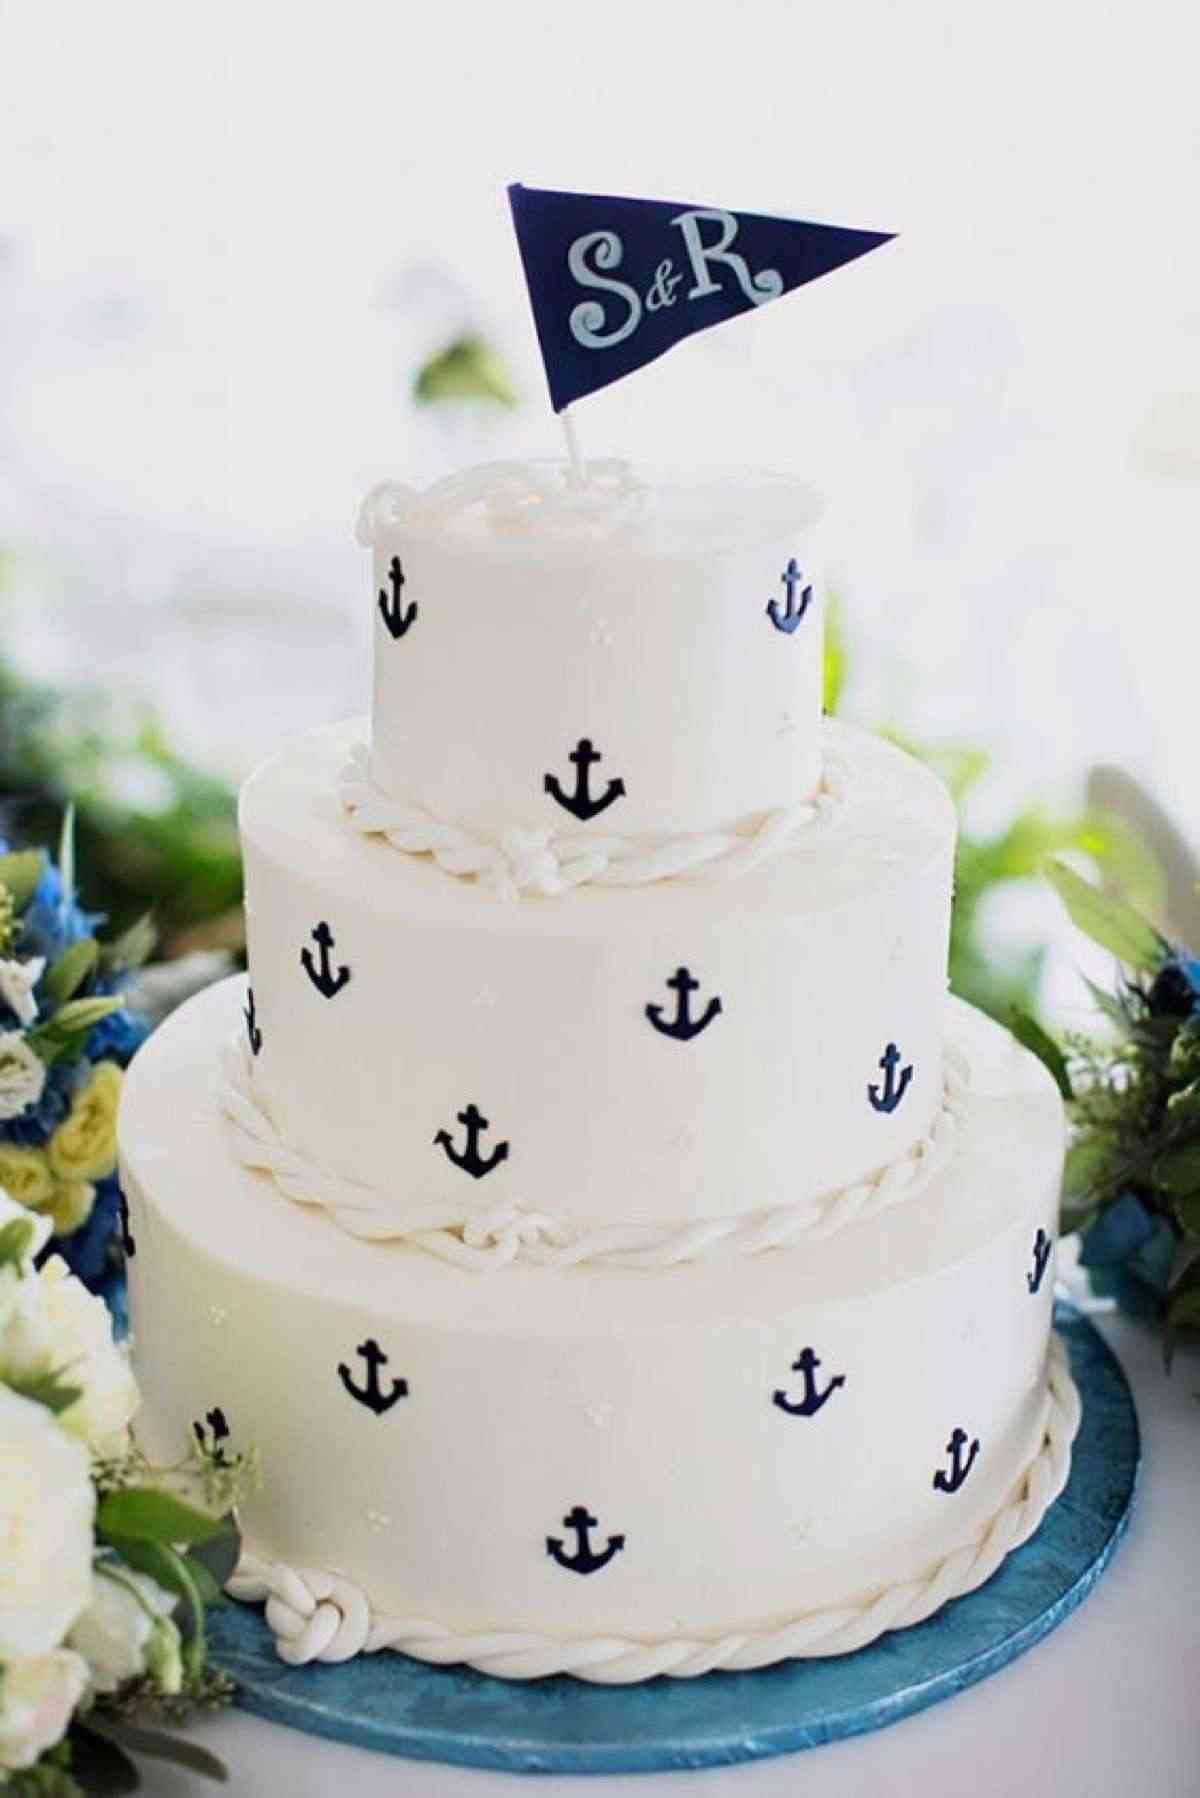 decoración de pasteles de boda